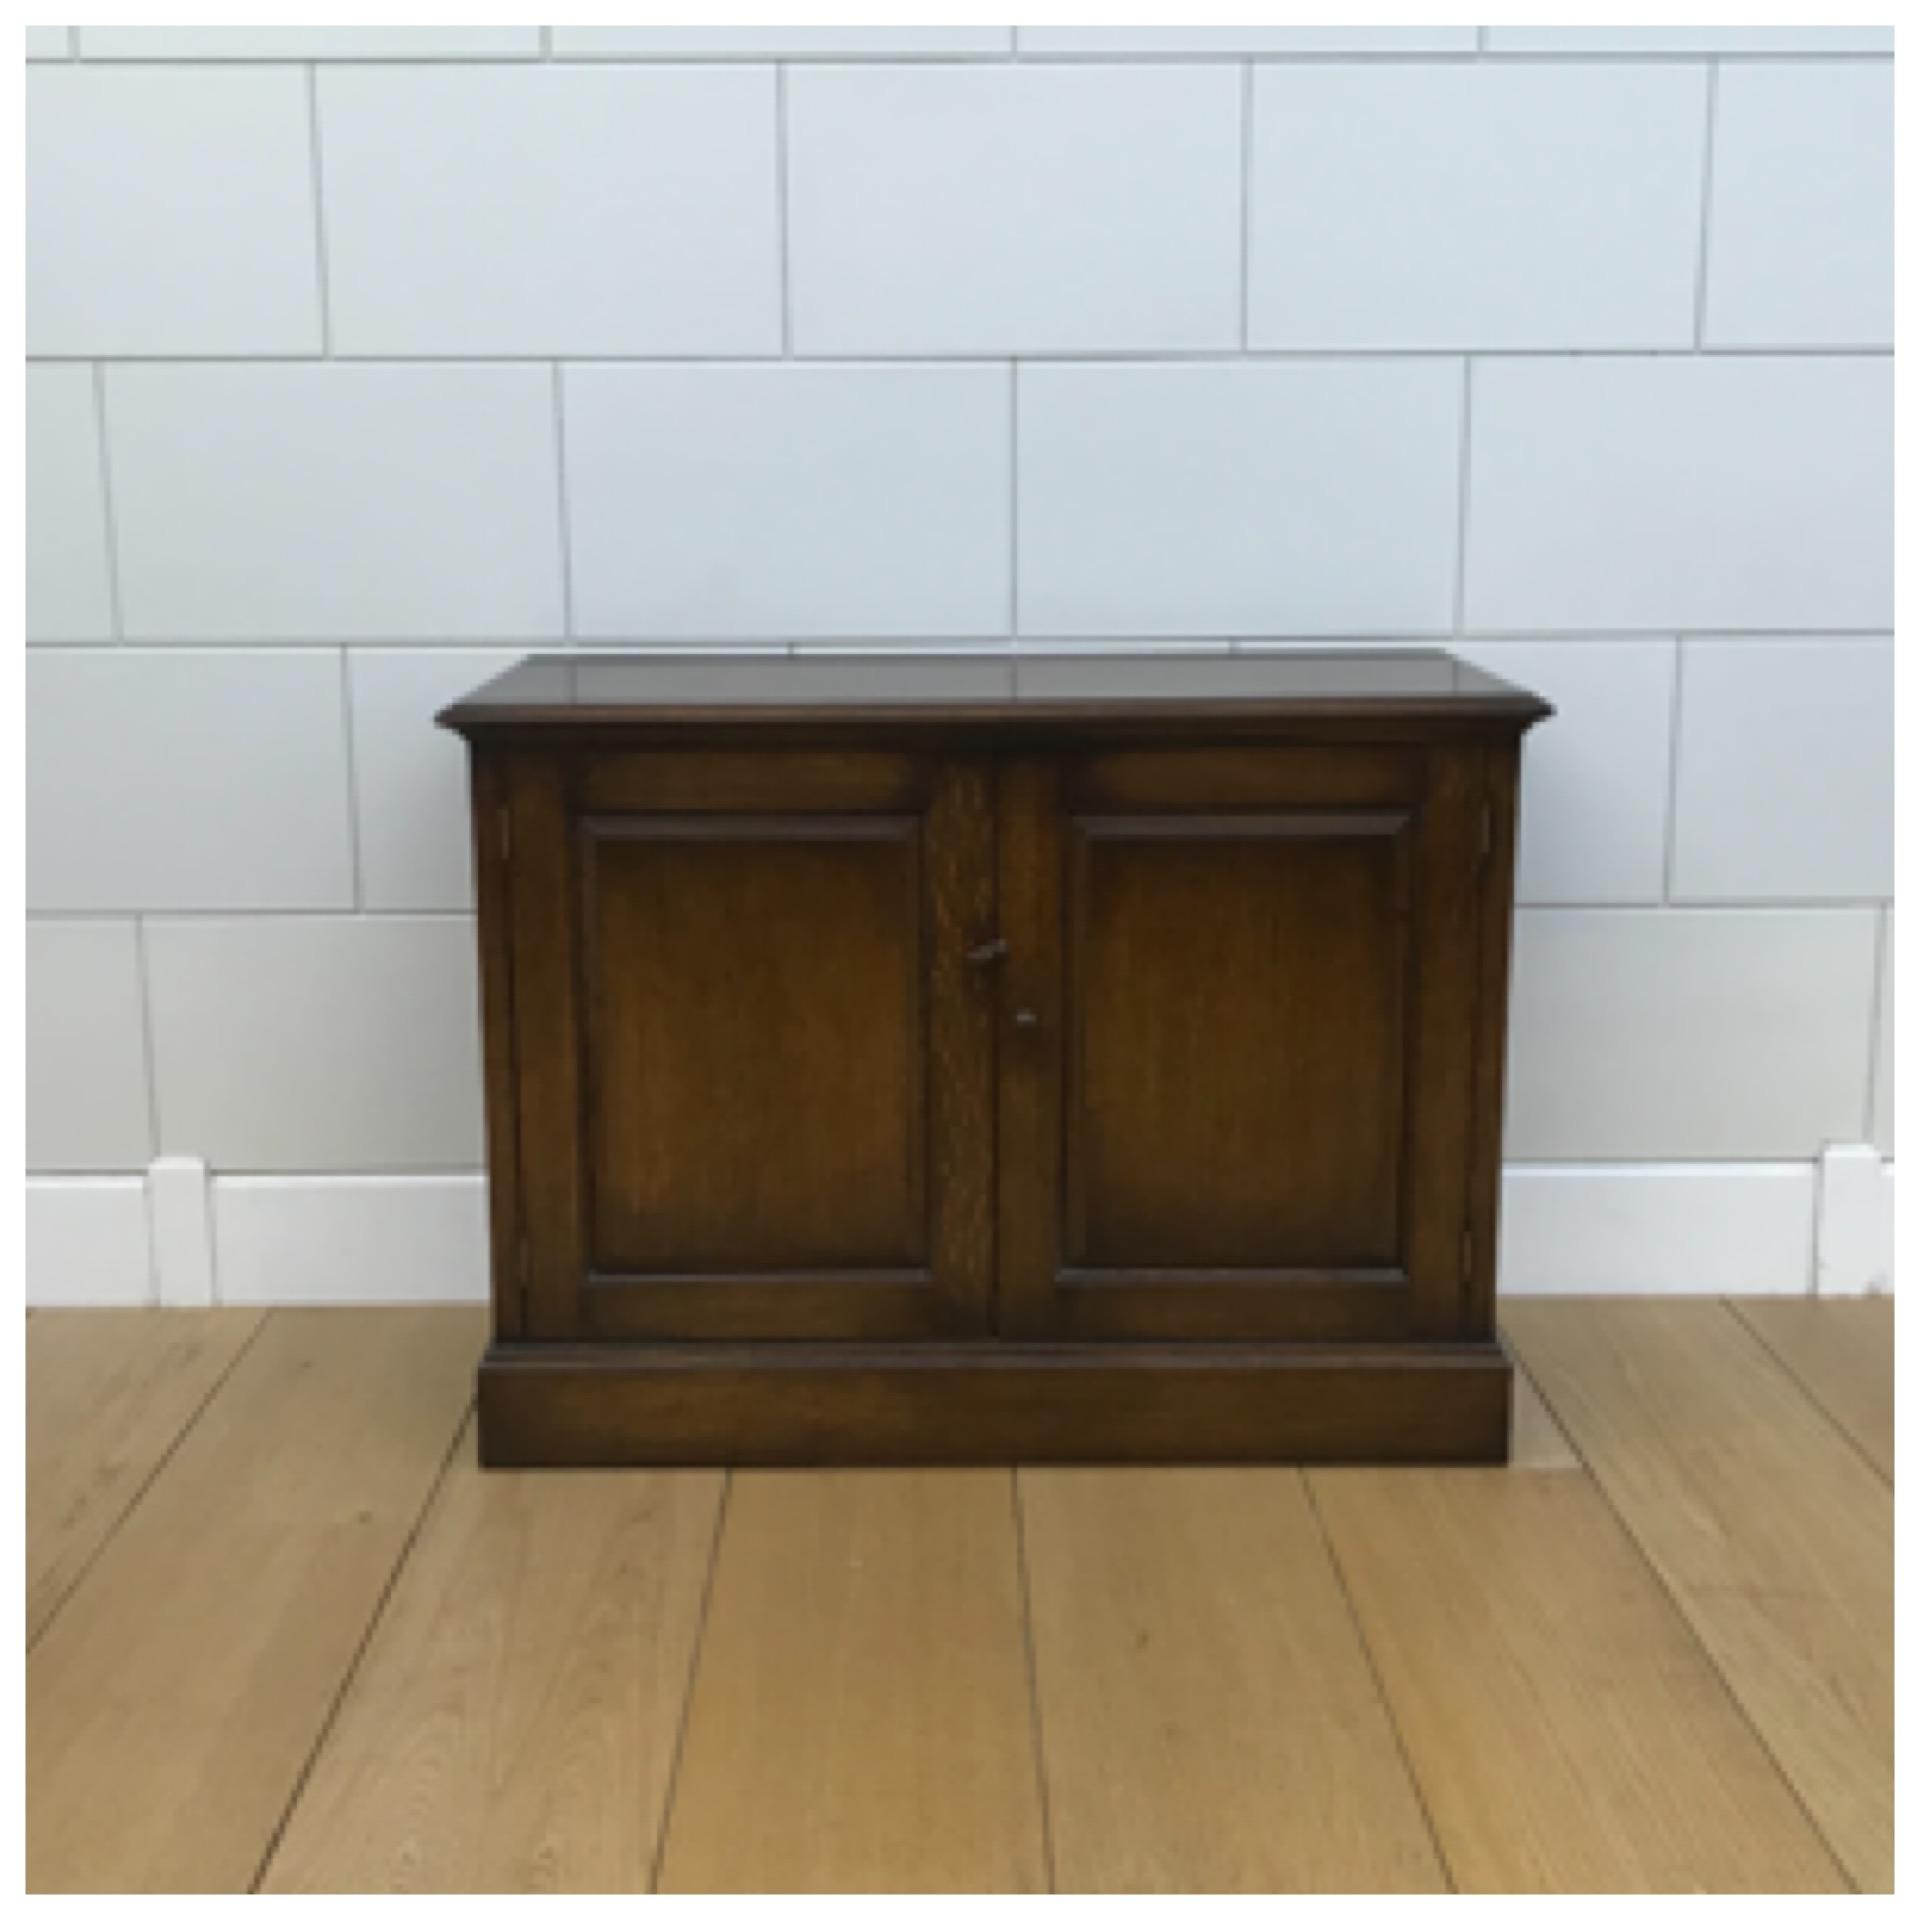 Sale Price: £585